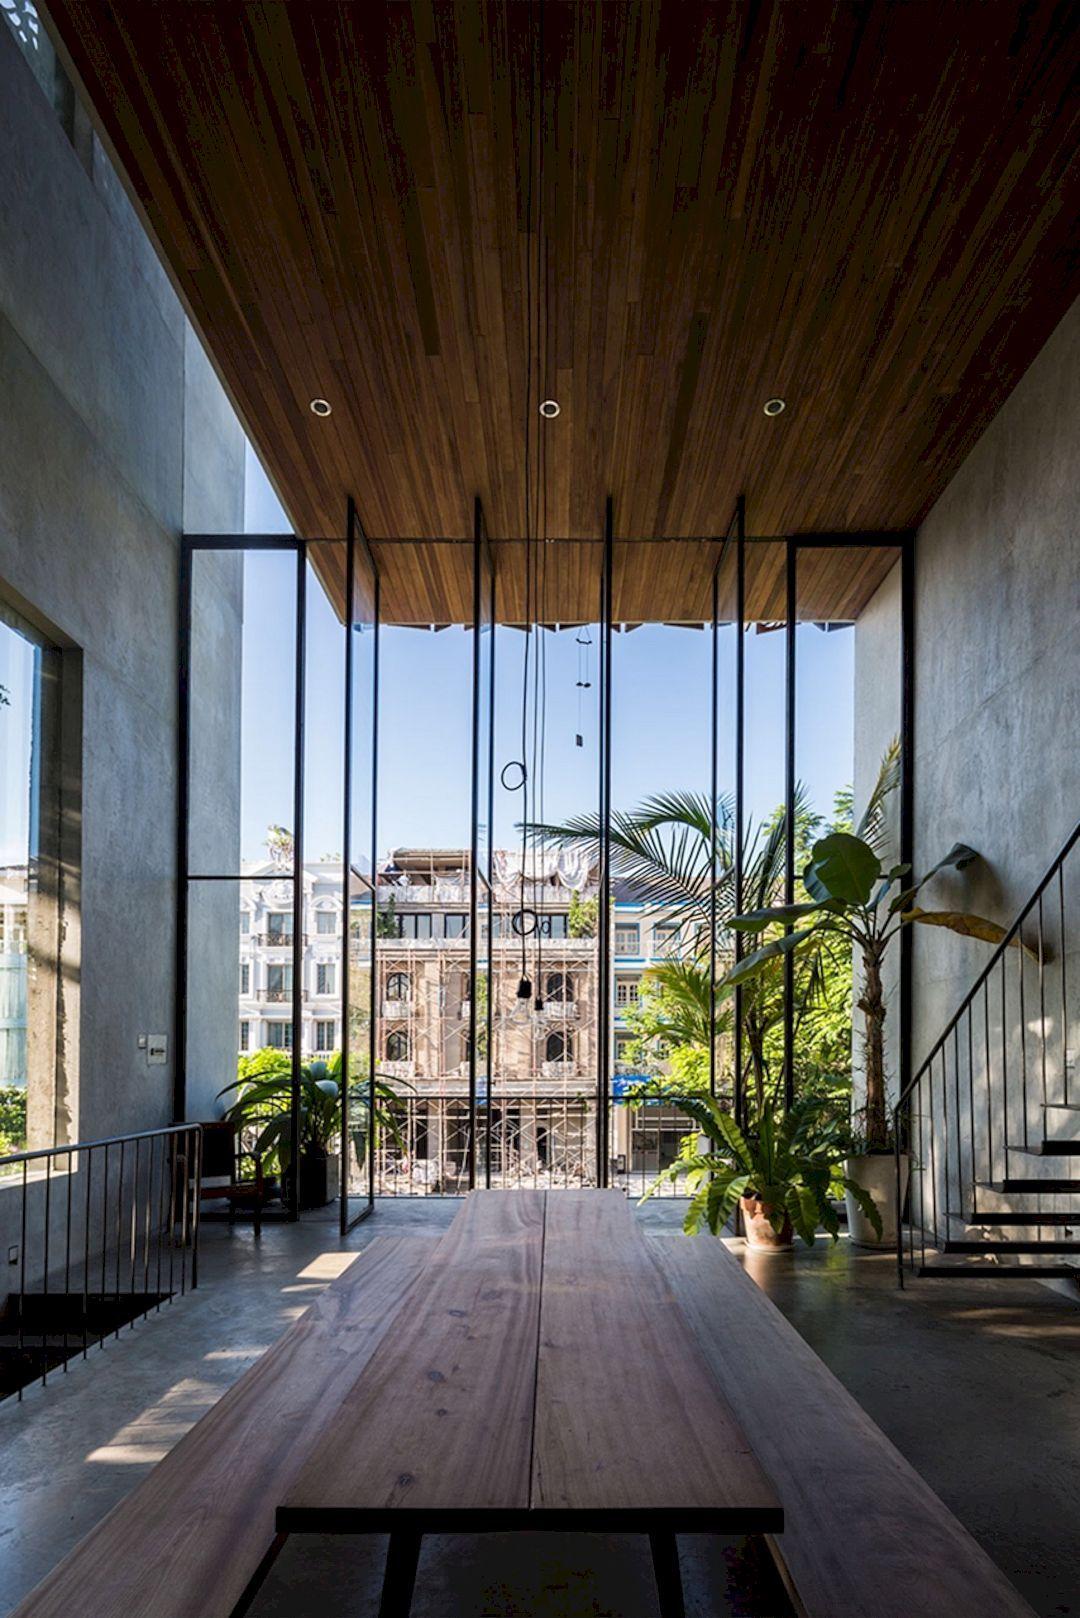 Best Large Glass Window/Door Ideas To Enjoy The Perfect View  Https://www.futuristarchitecture.com/20268 Glass Windows Doors.html